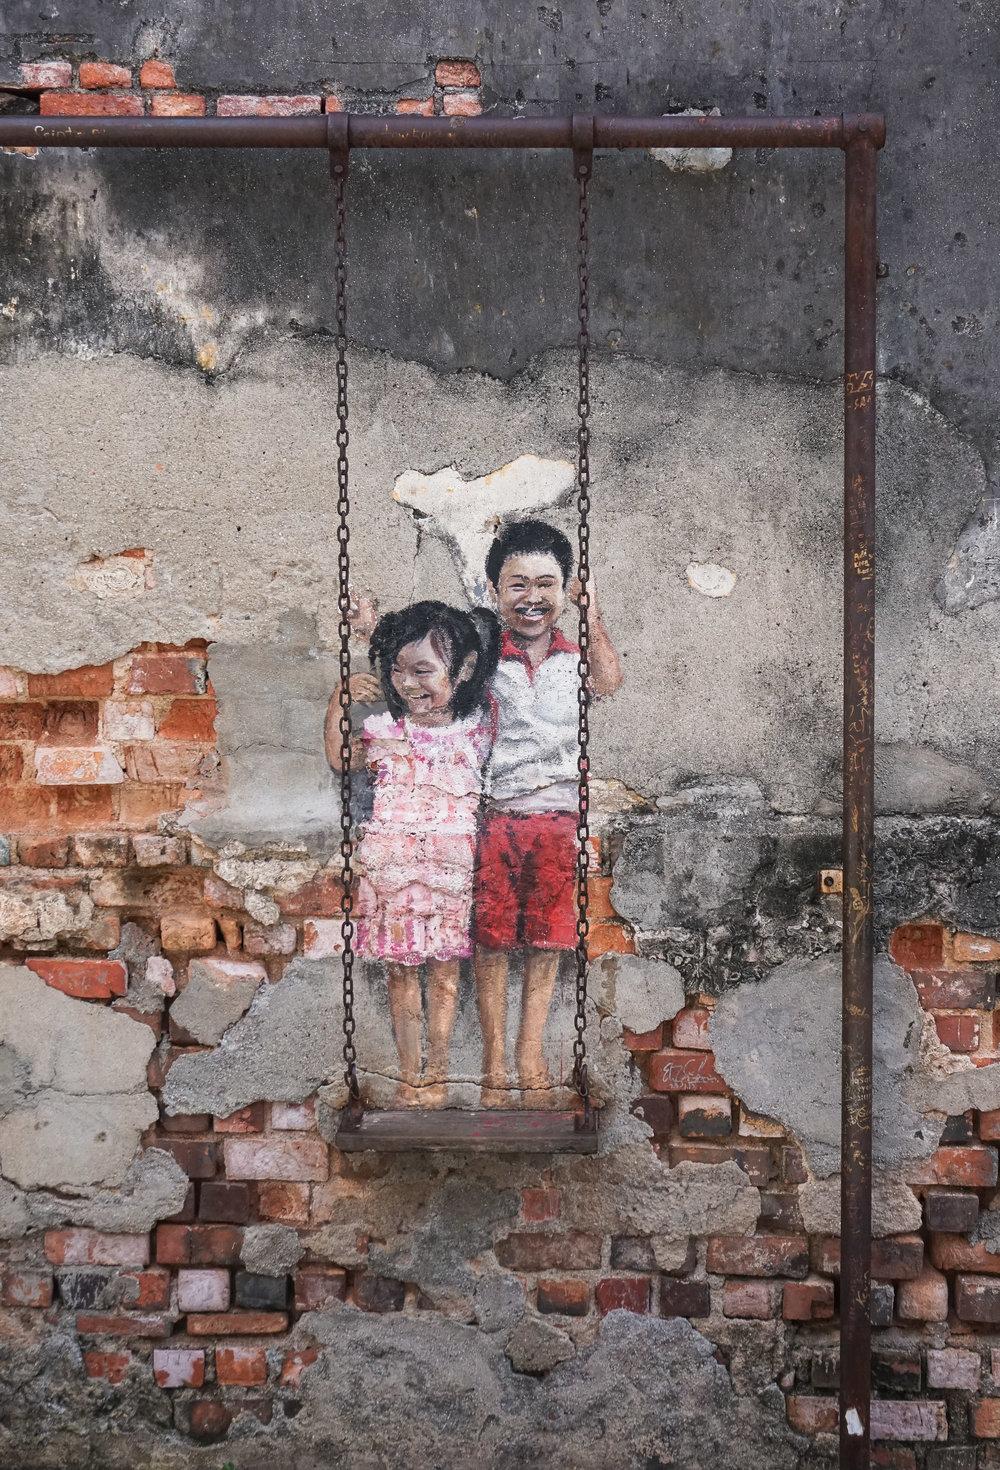 curio.trips.malaysia.penang.street.art.girl.boy.swing.portrait.jpg